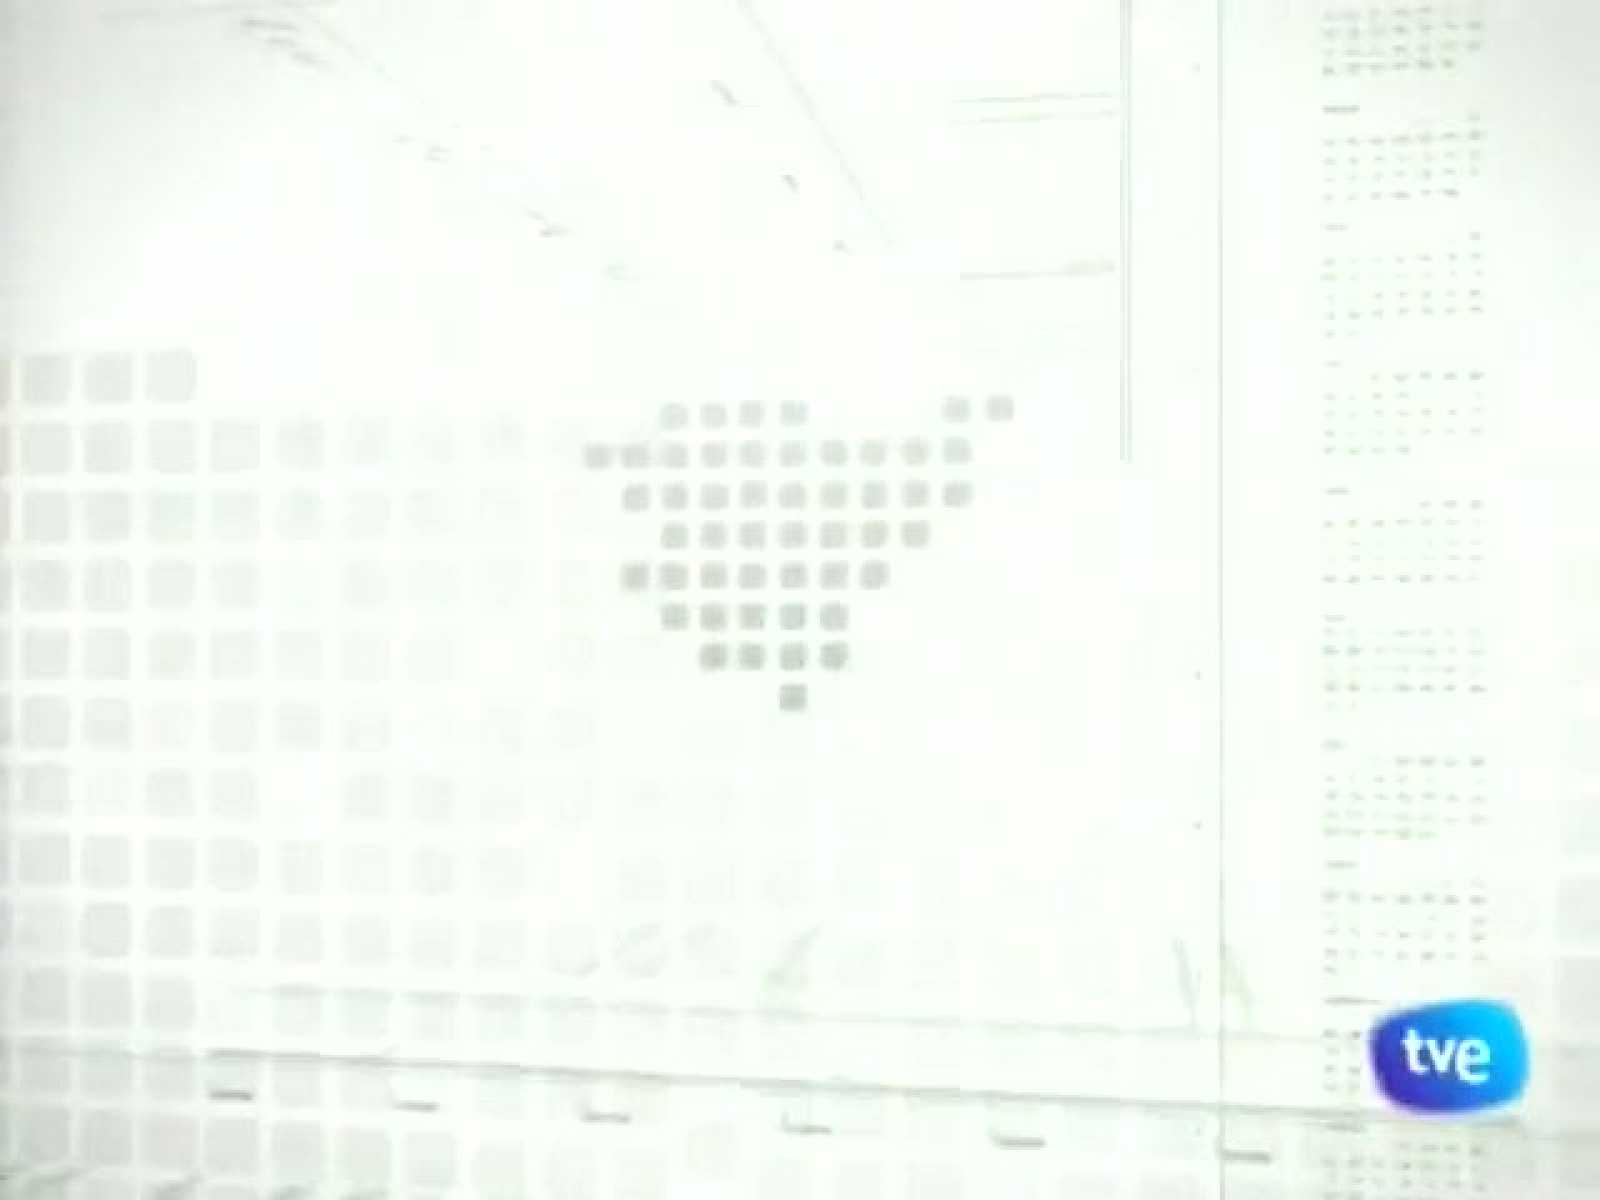 Telenorte País Vasco - 02/06/11